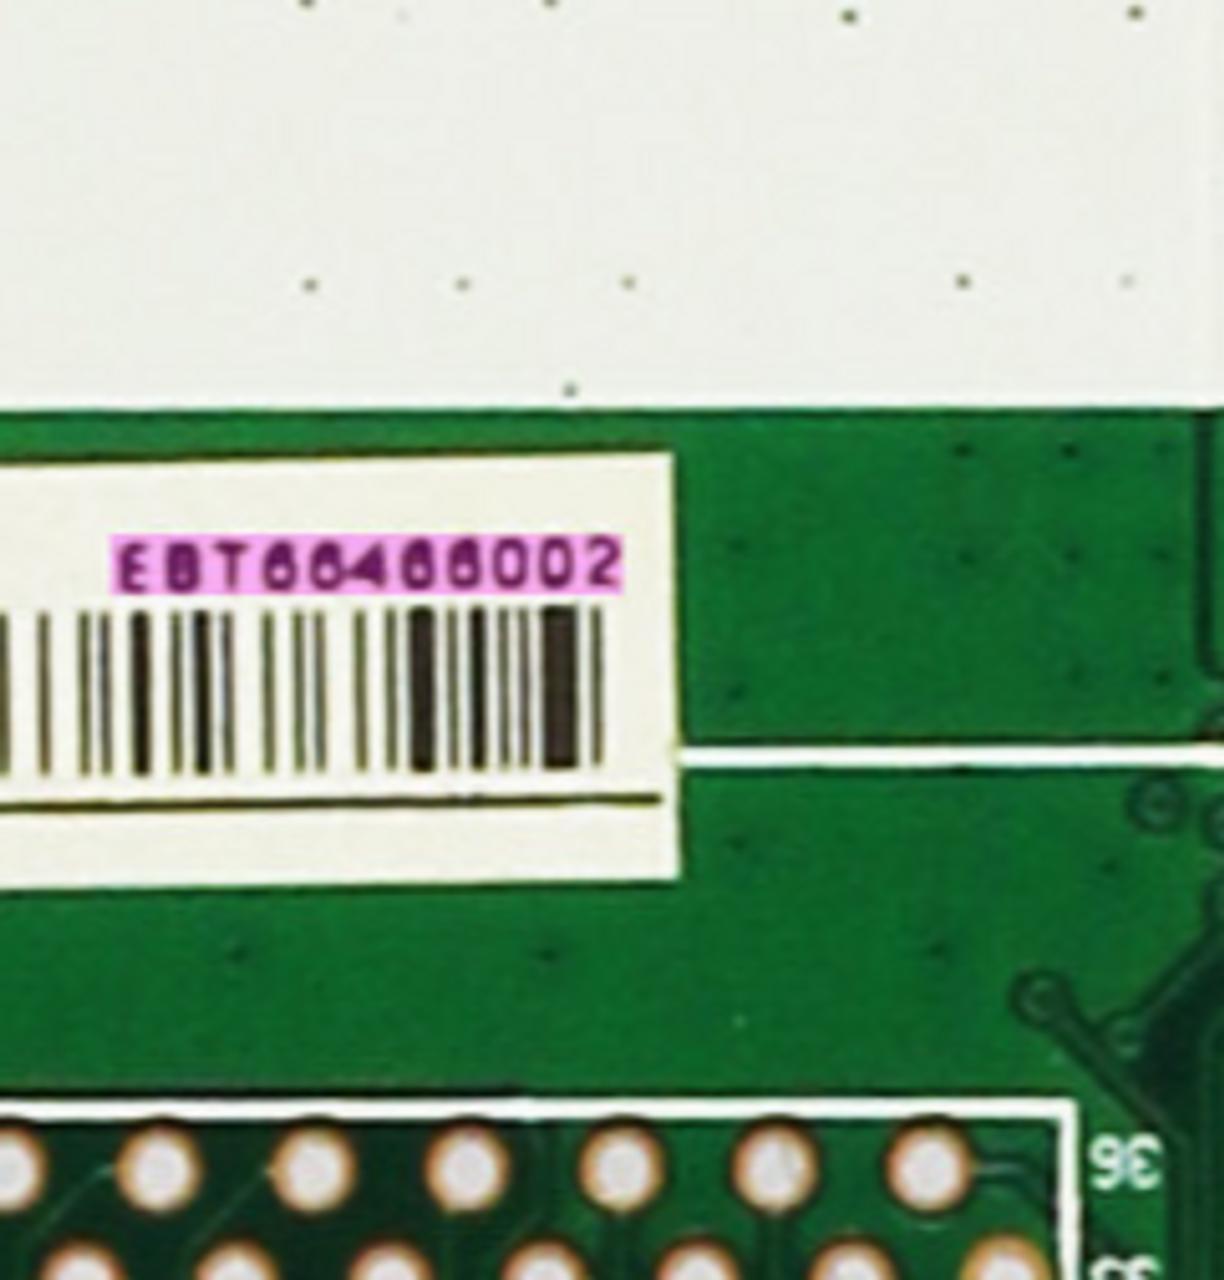 LG EBT66466002 Main Board for 65UN7300AUD.BUSFLKR